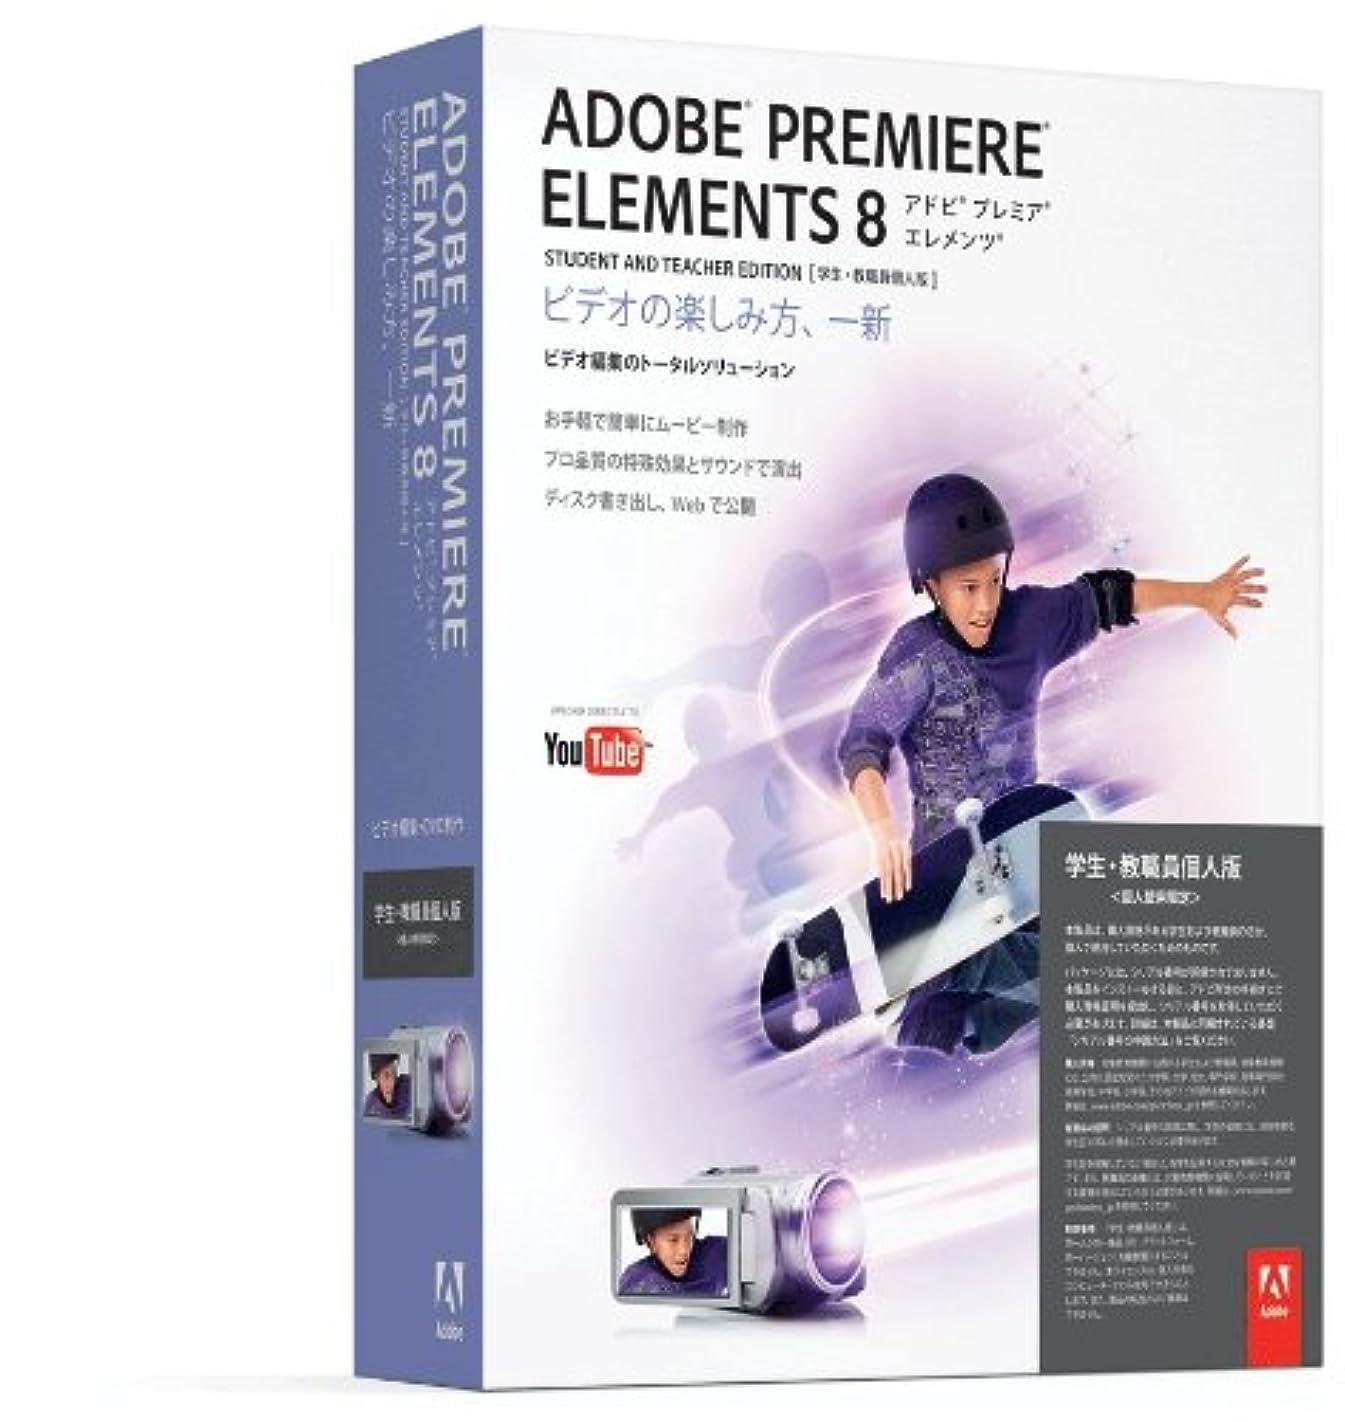 湿った財政変成器学生?教職員個人版 Adobe Premiere Elements 8 日本語版 Windows版 (要シリアル番号申請)